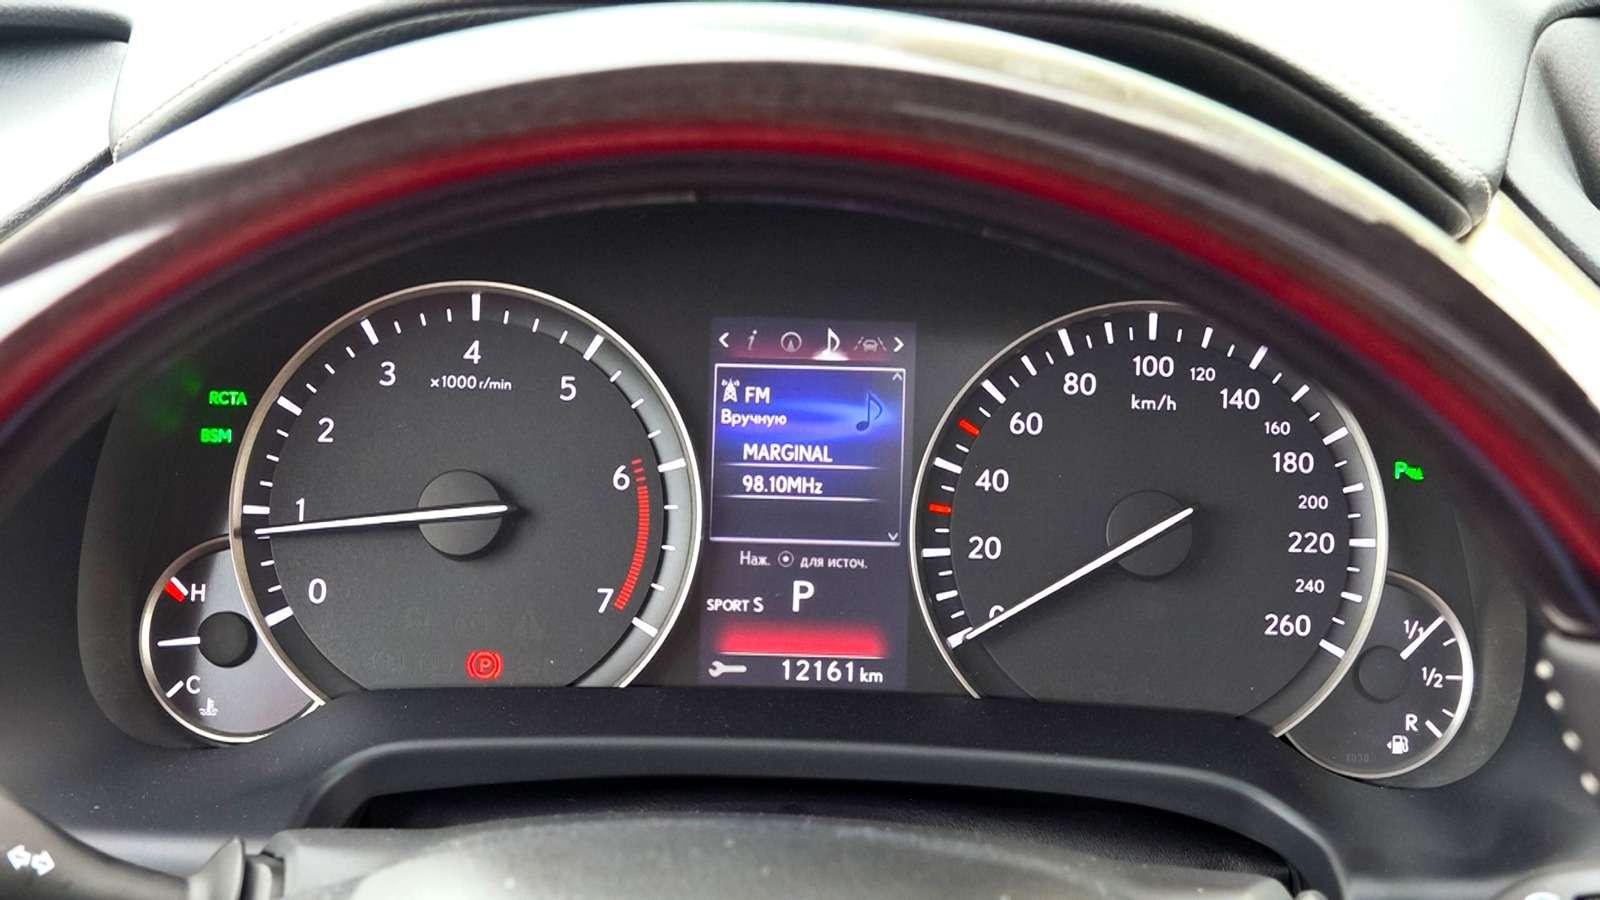 05-Lexus_zr-02_16